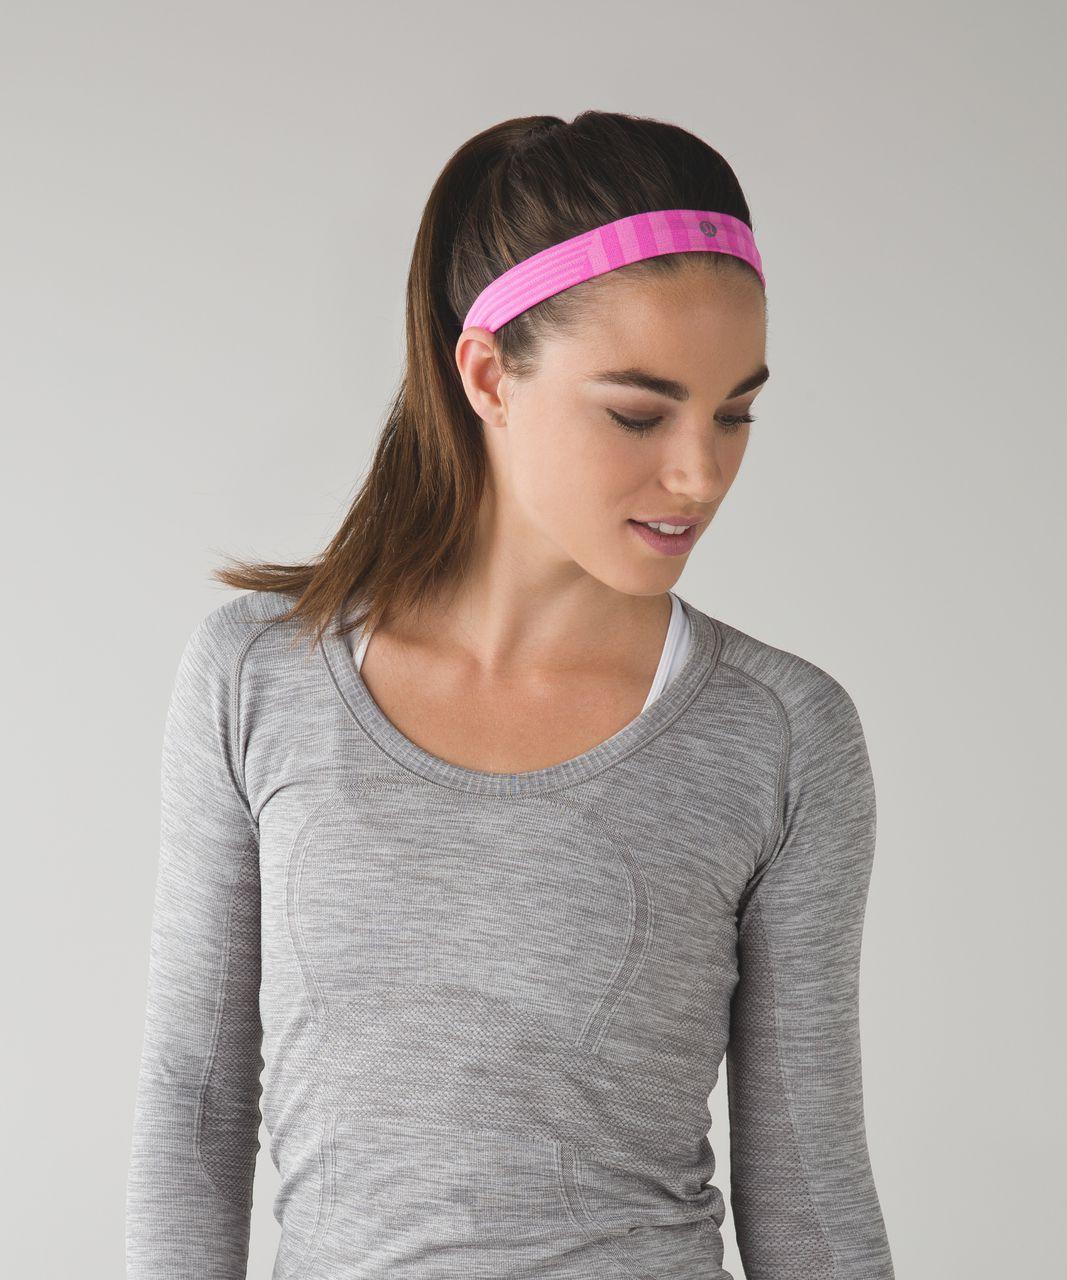 Lululemon Cardio Cross Trainer Headband - Raspberry Glo Light